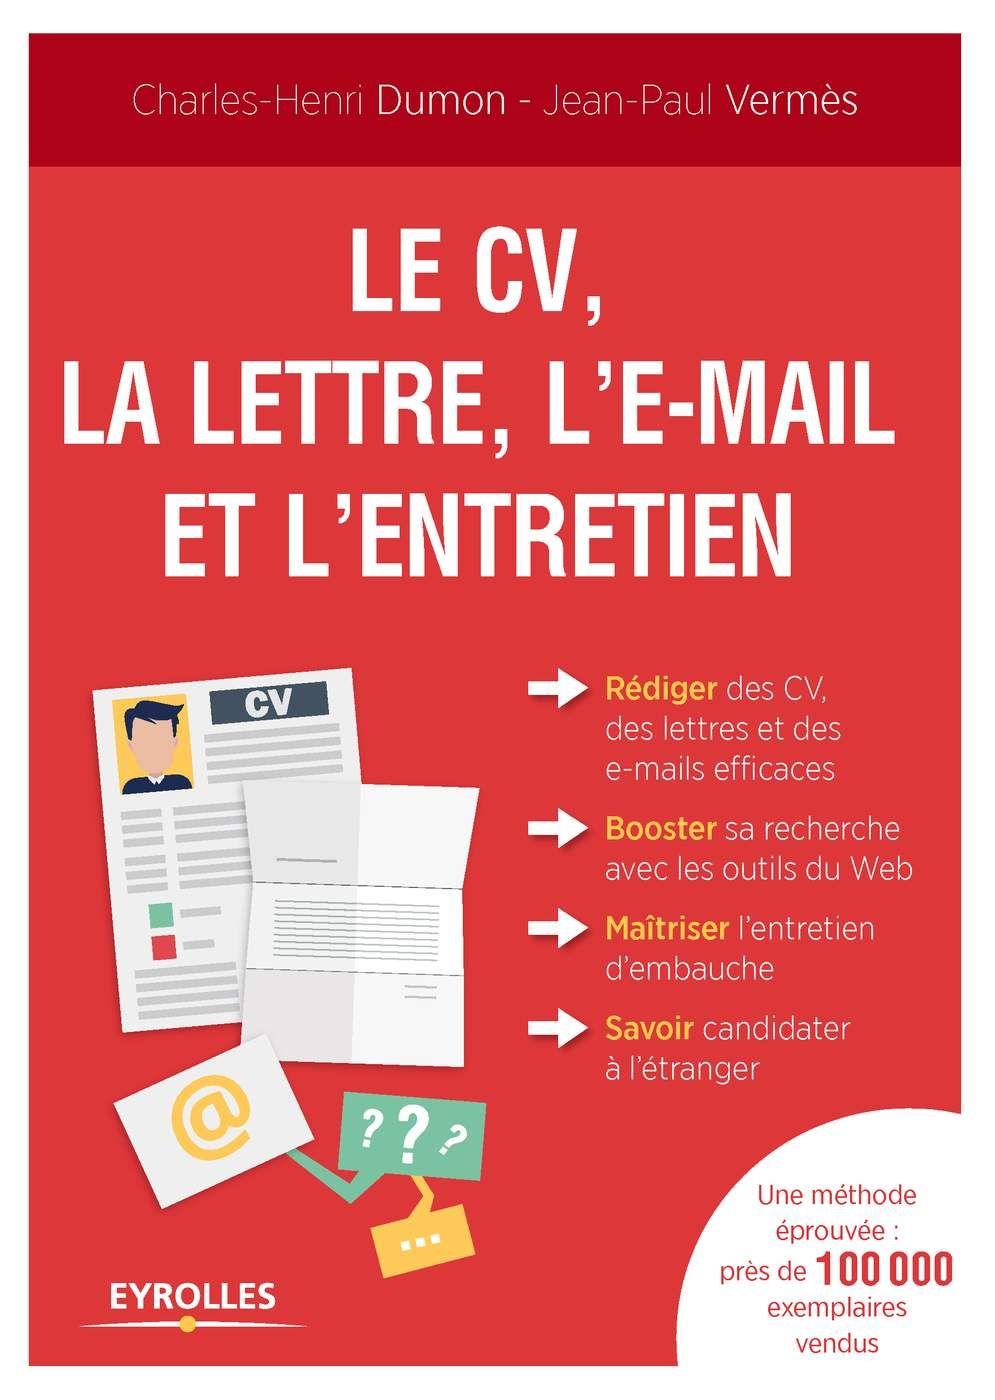 Le Cv La Lettre L E Mail Et L Entretien Pdf Resume Design Resume Design Free Resume